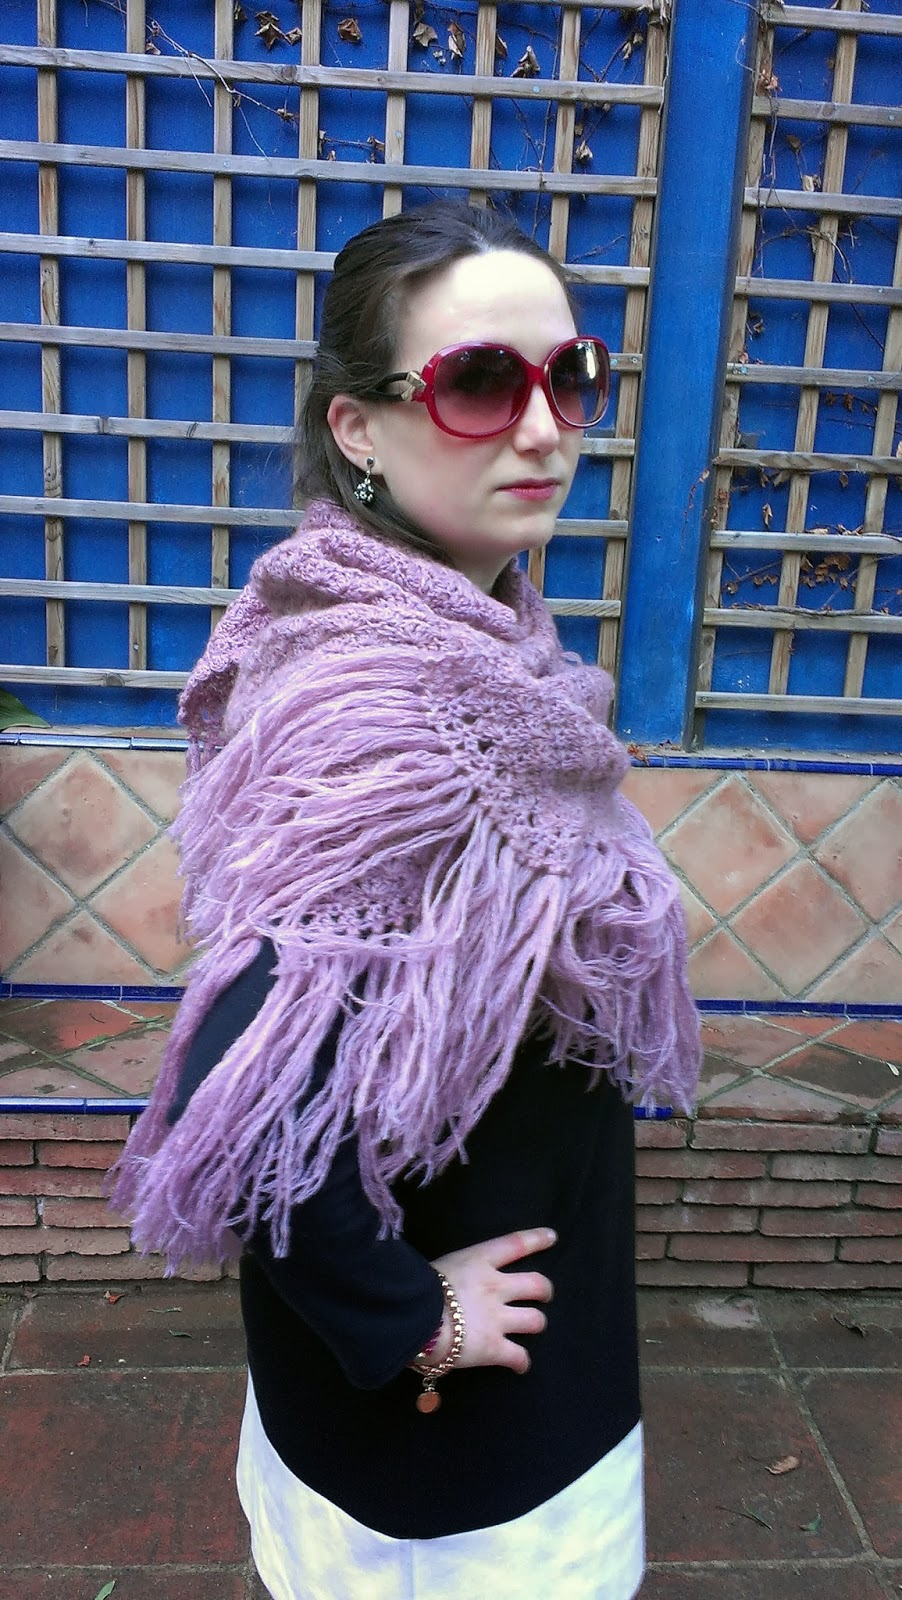 firmoo sunglasses pink gafas de sol rosas sesentero sixties modistilla de pacotilla